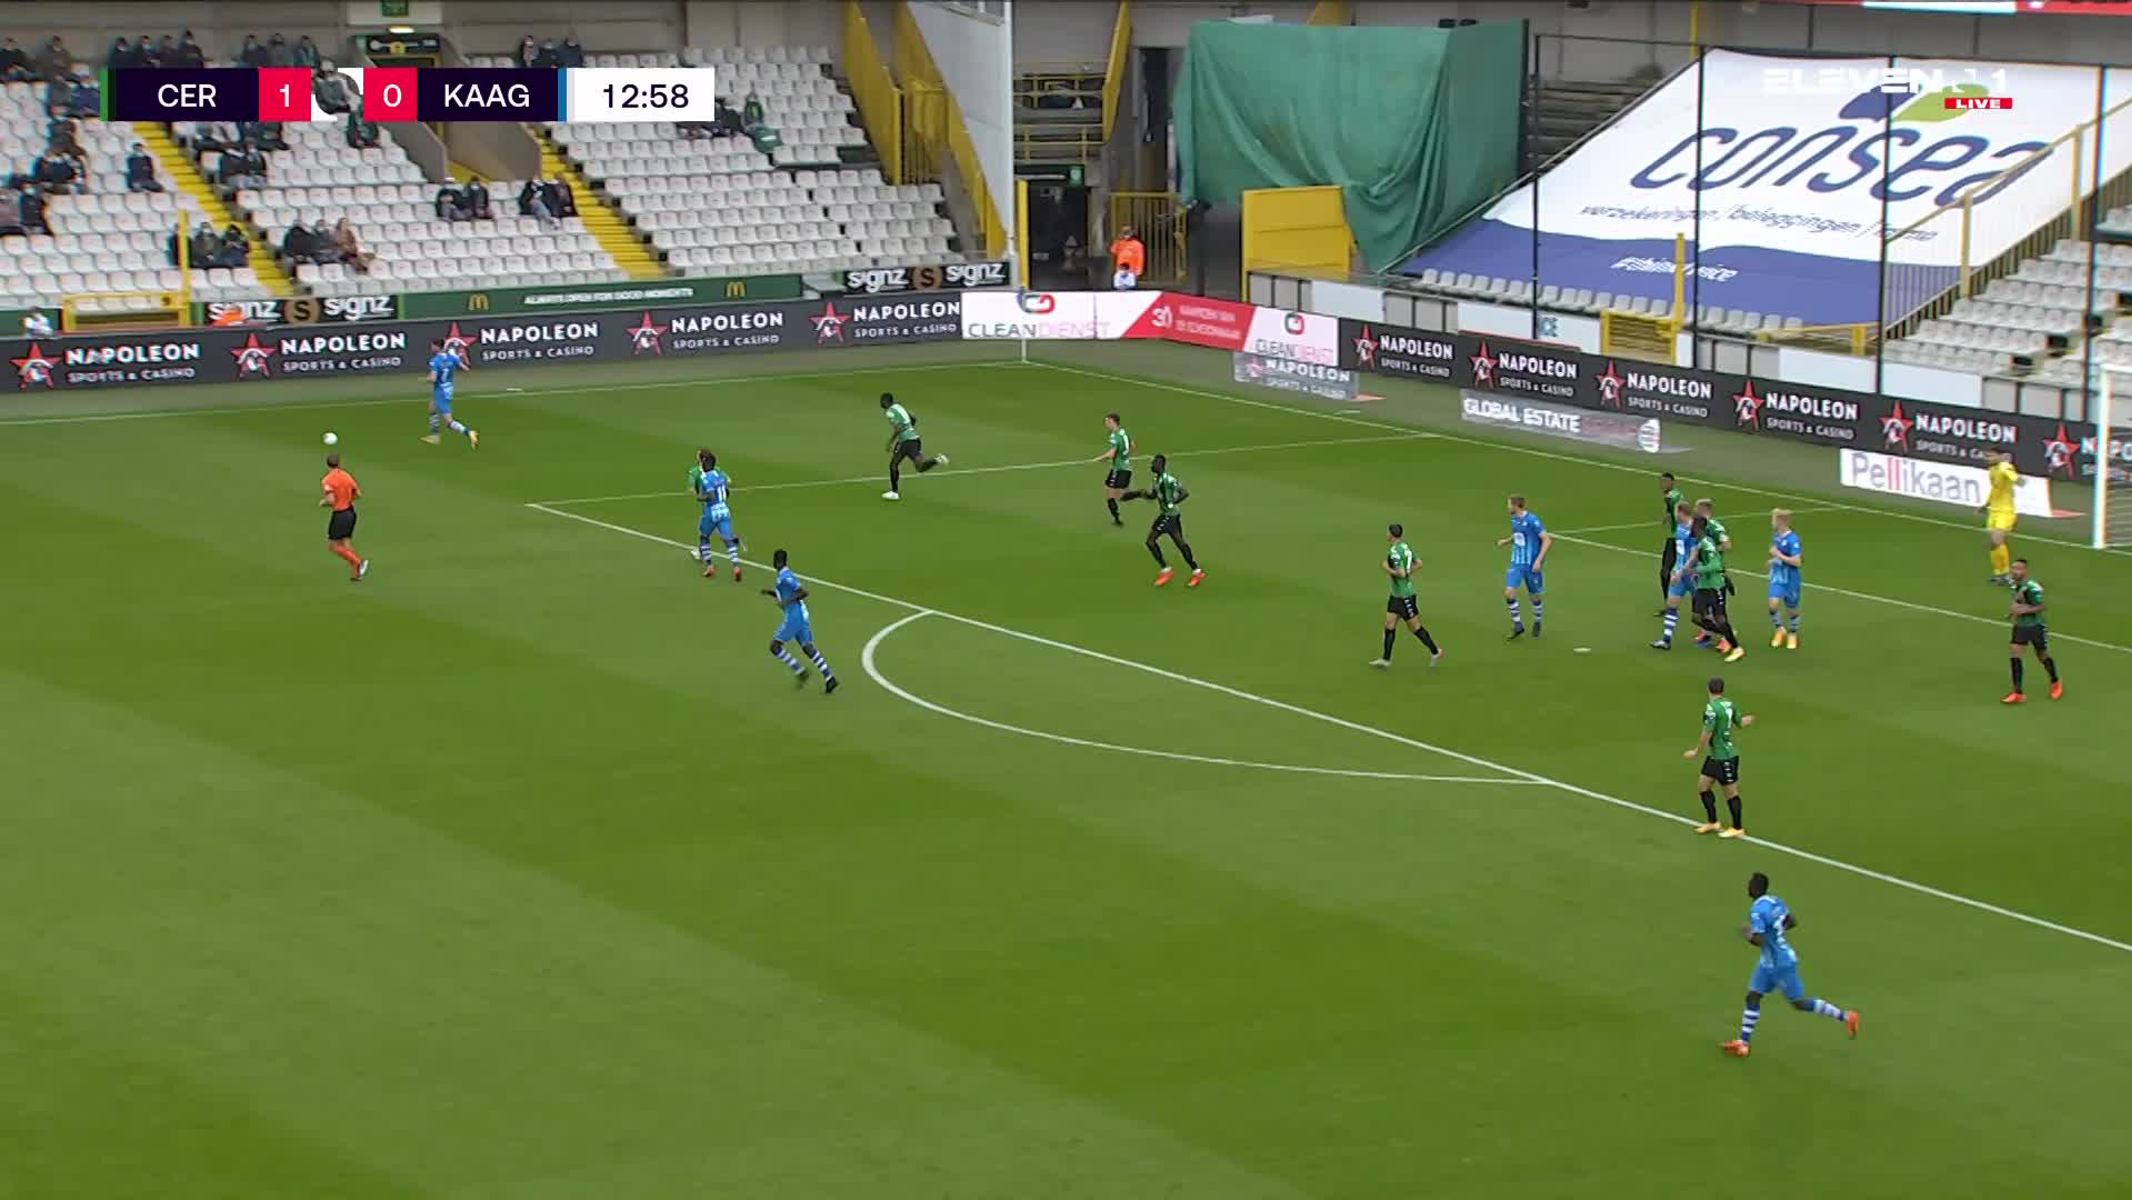 Doelpunt Andreas Hanche-Olsen (Cercle Brugge vs. KAA Gent)